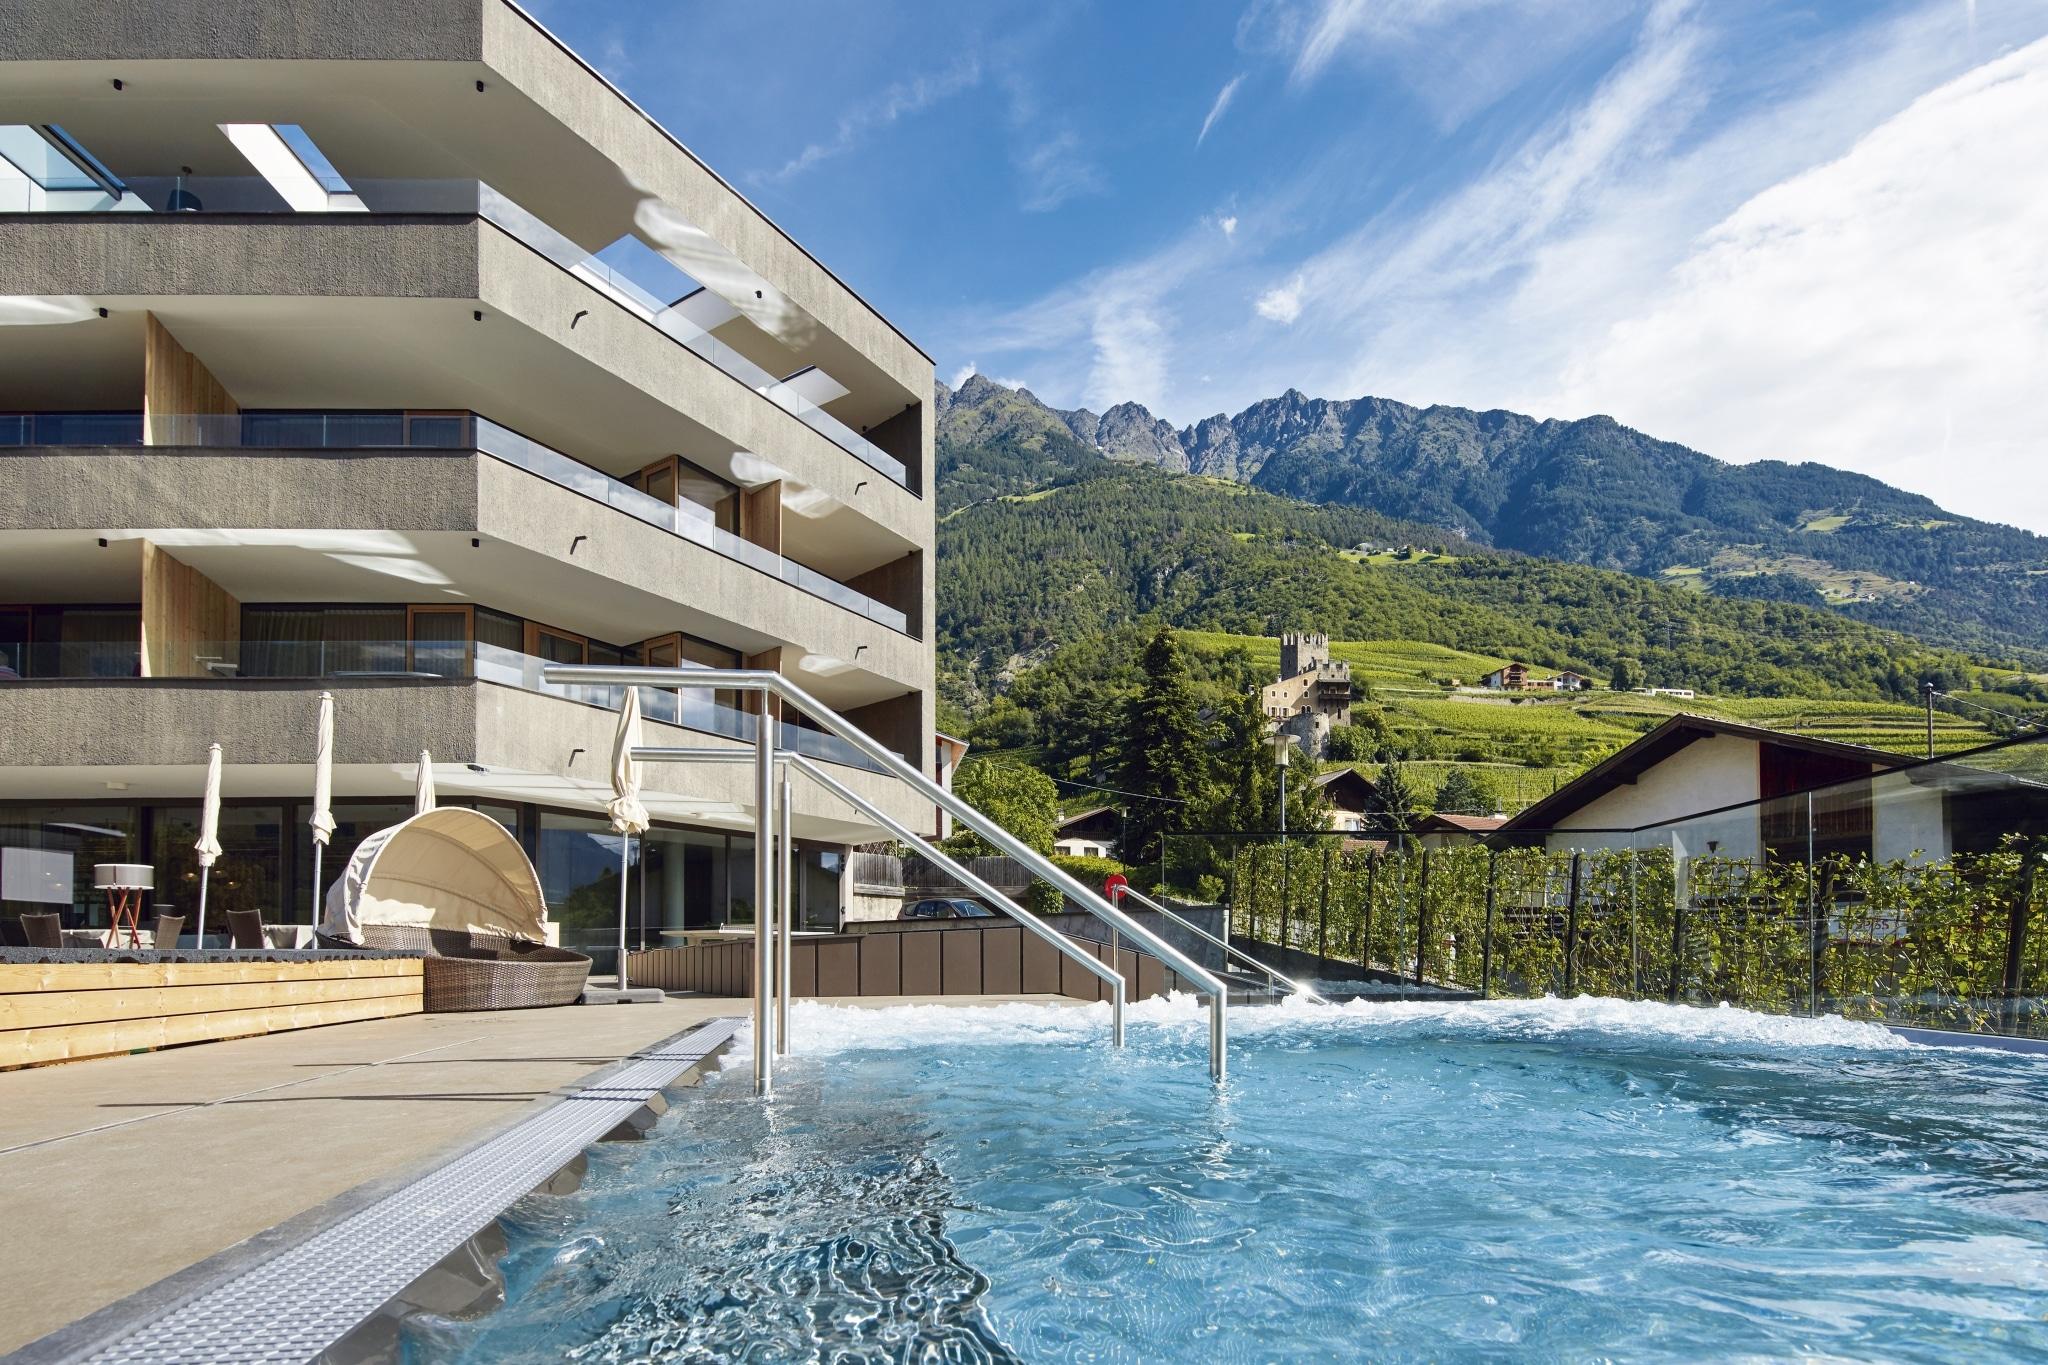 Hotel und Pool - Lindenhof in Meran